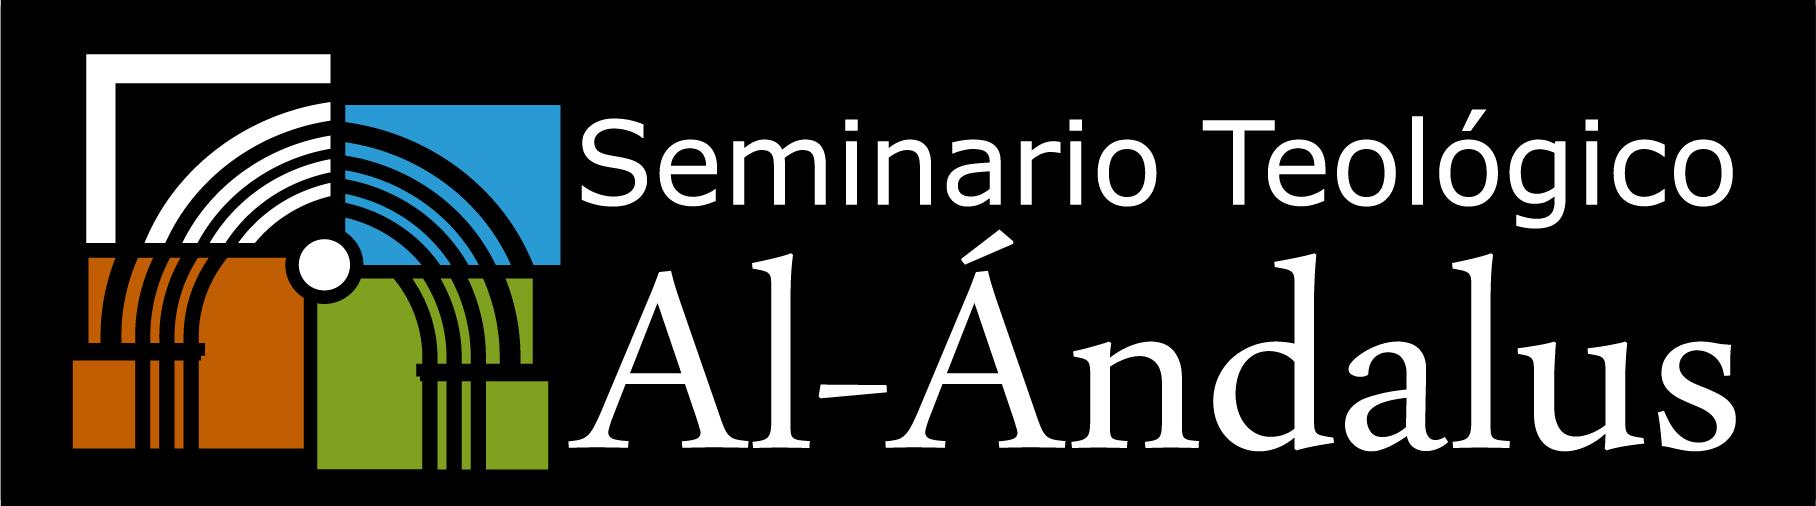 Semiario Teologico - Al-Andalus